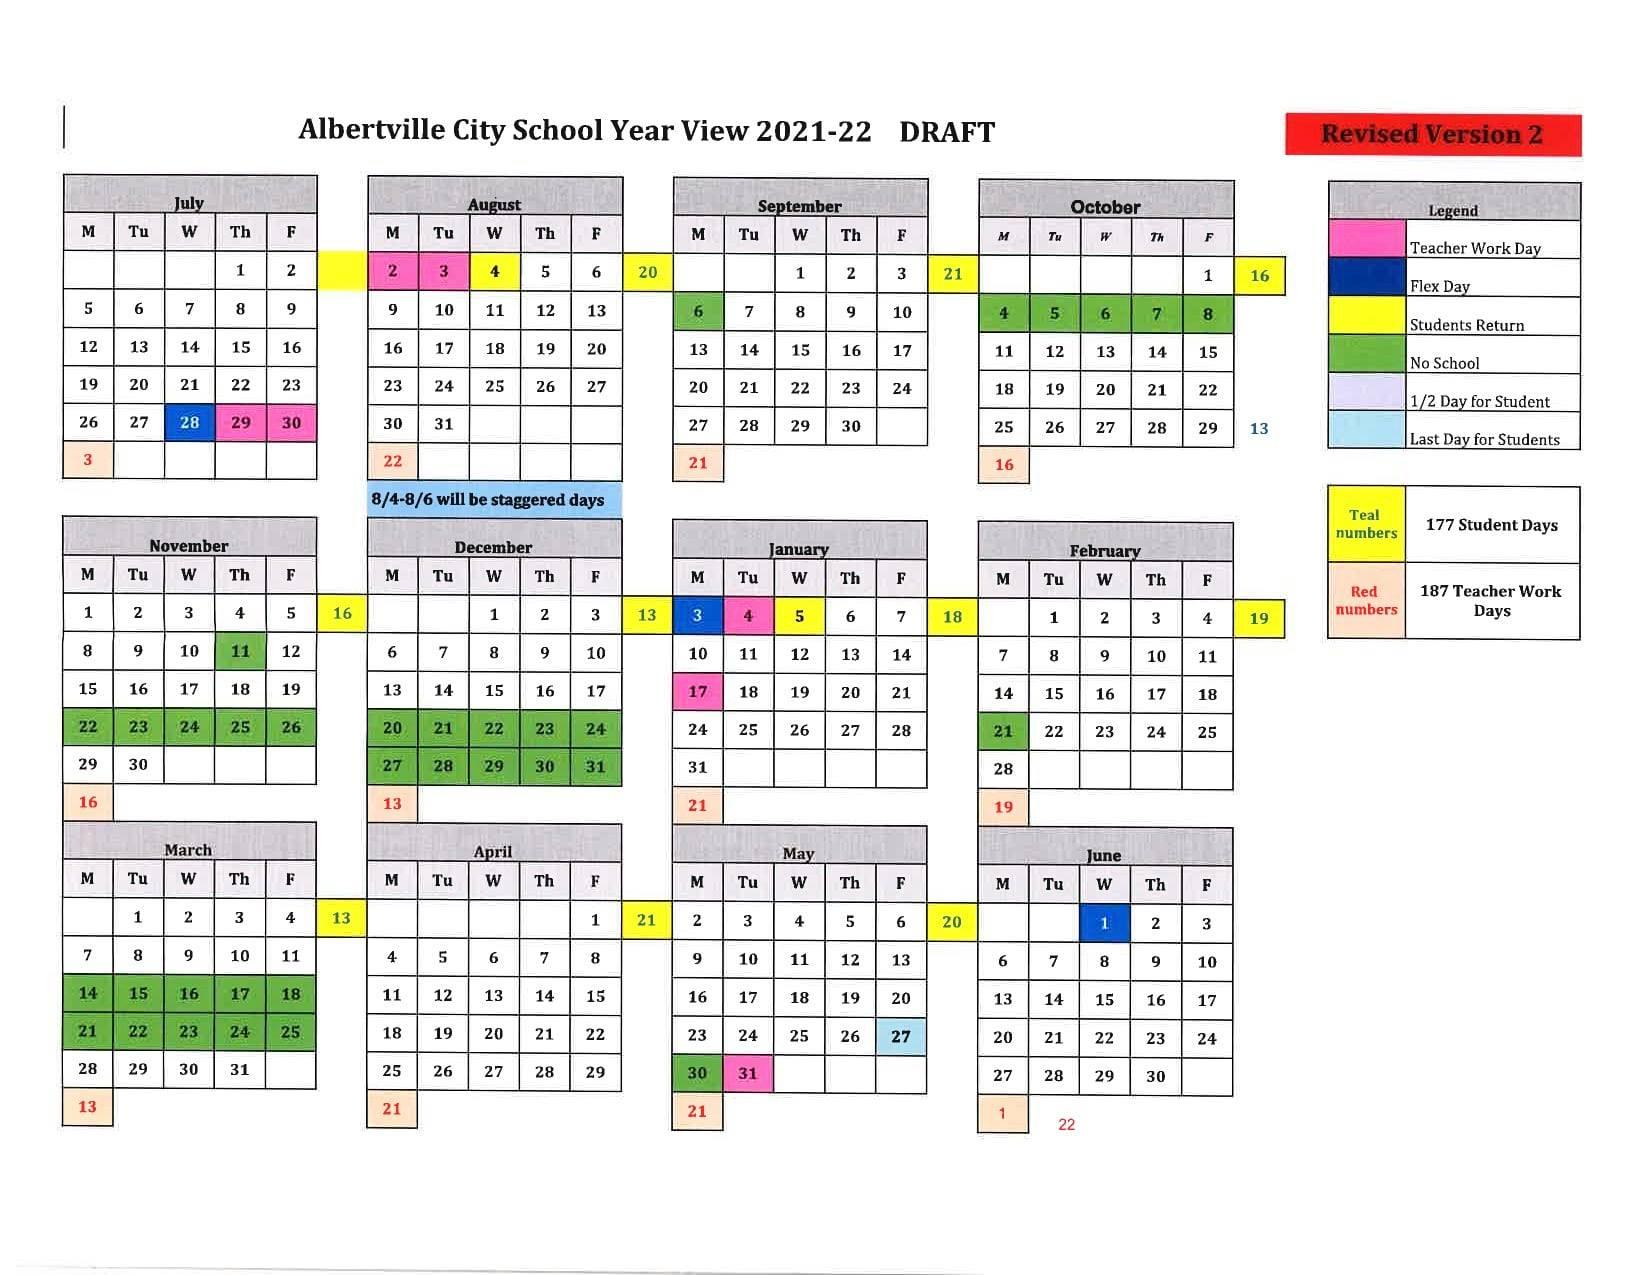 Huntsville City Schools Calendar 2022.Albertville City Schools Release Calendar For 2021 2022 School Term Whnt Com